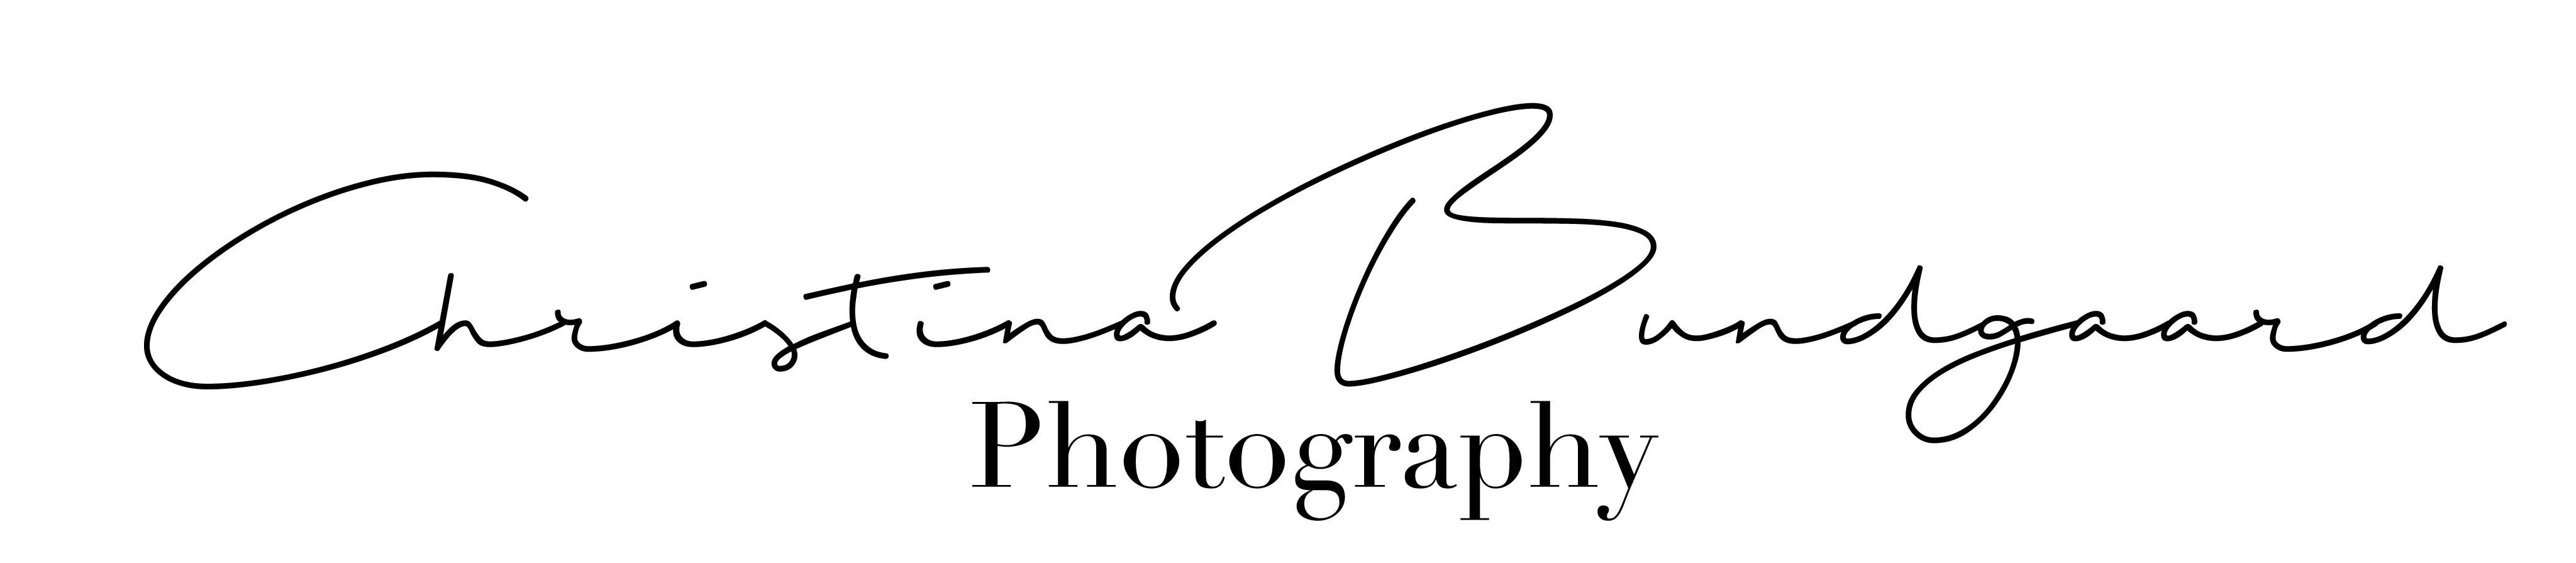 Christina Bundgaard Photography